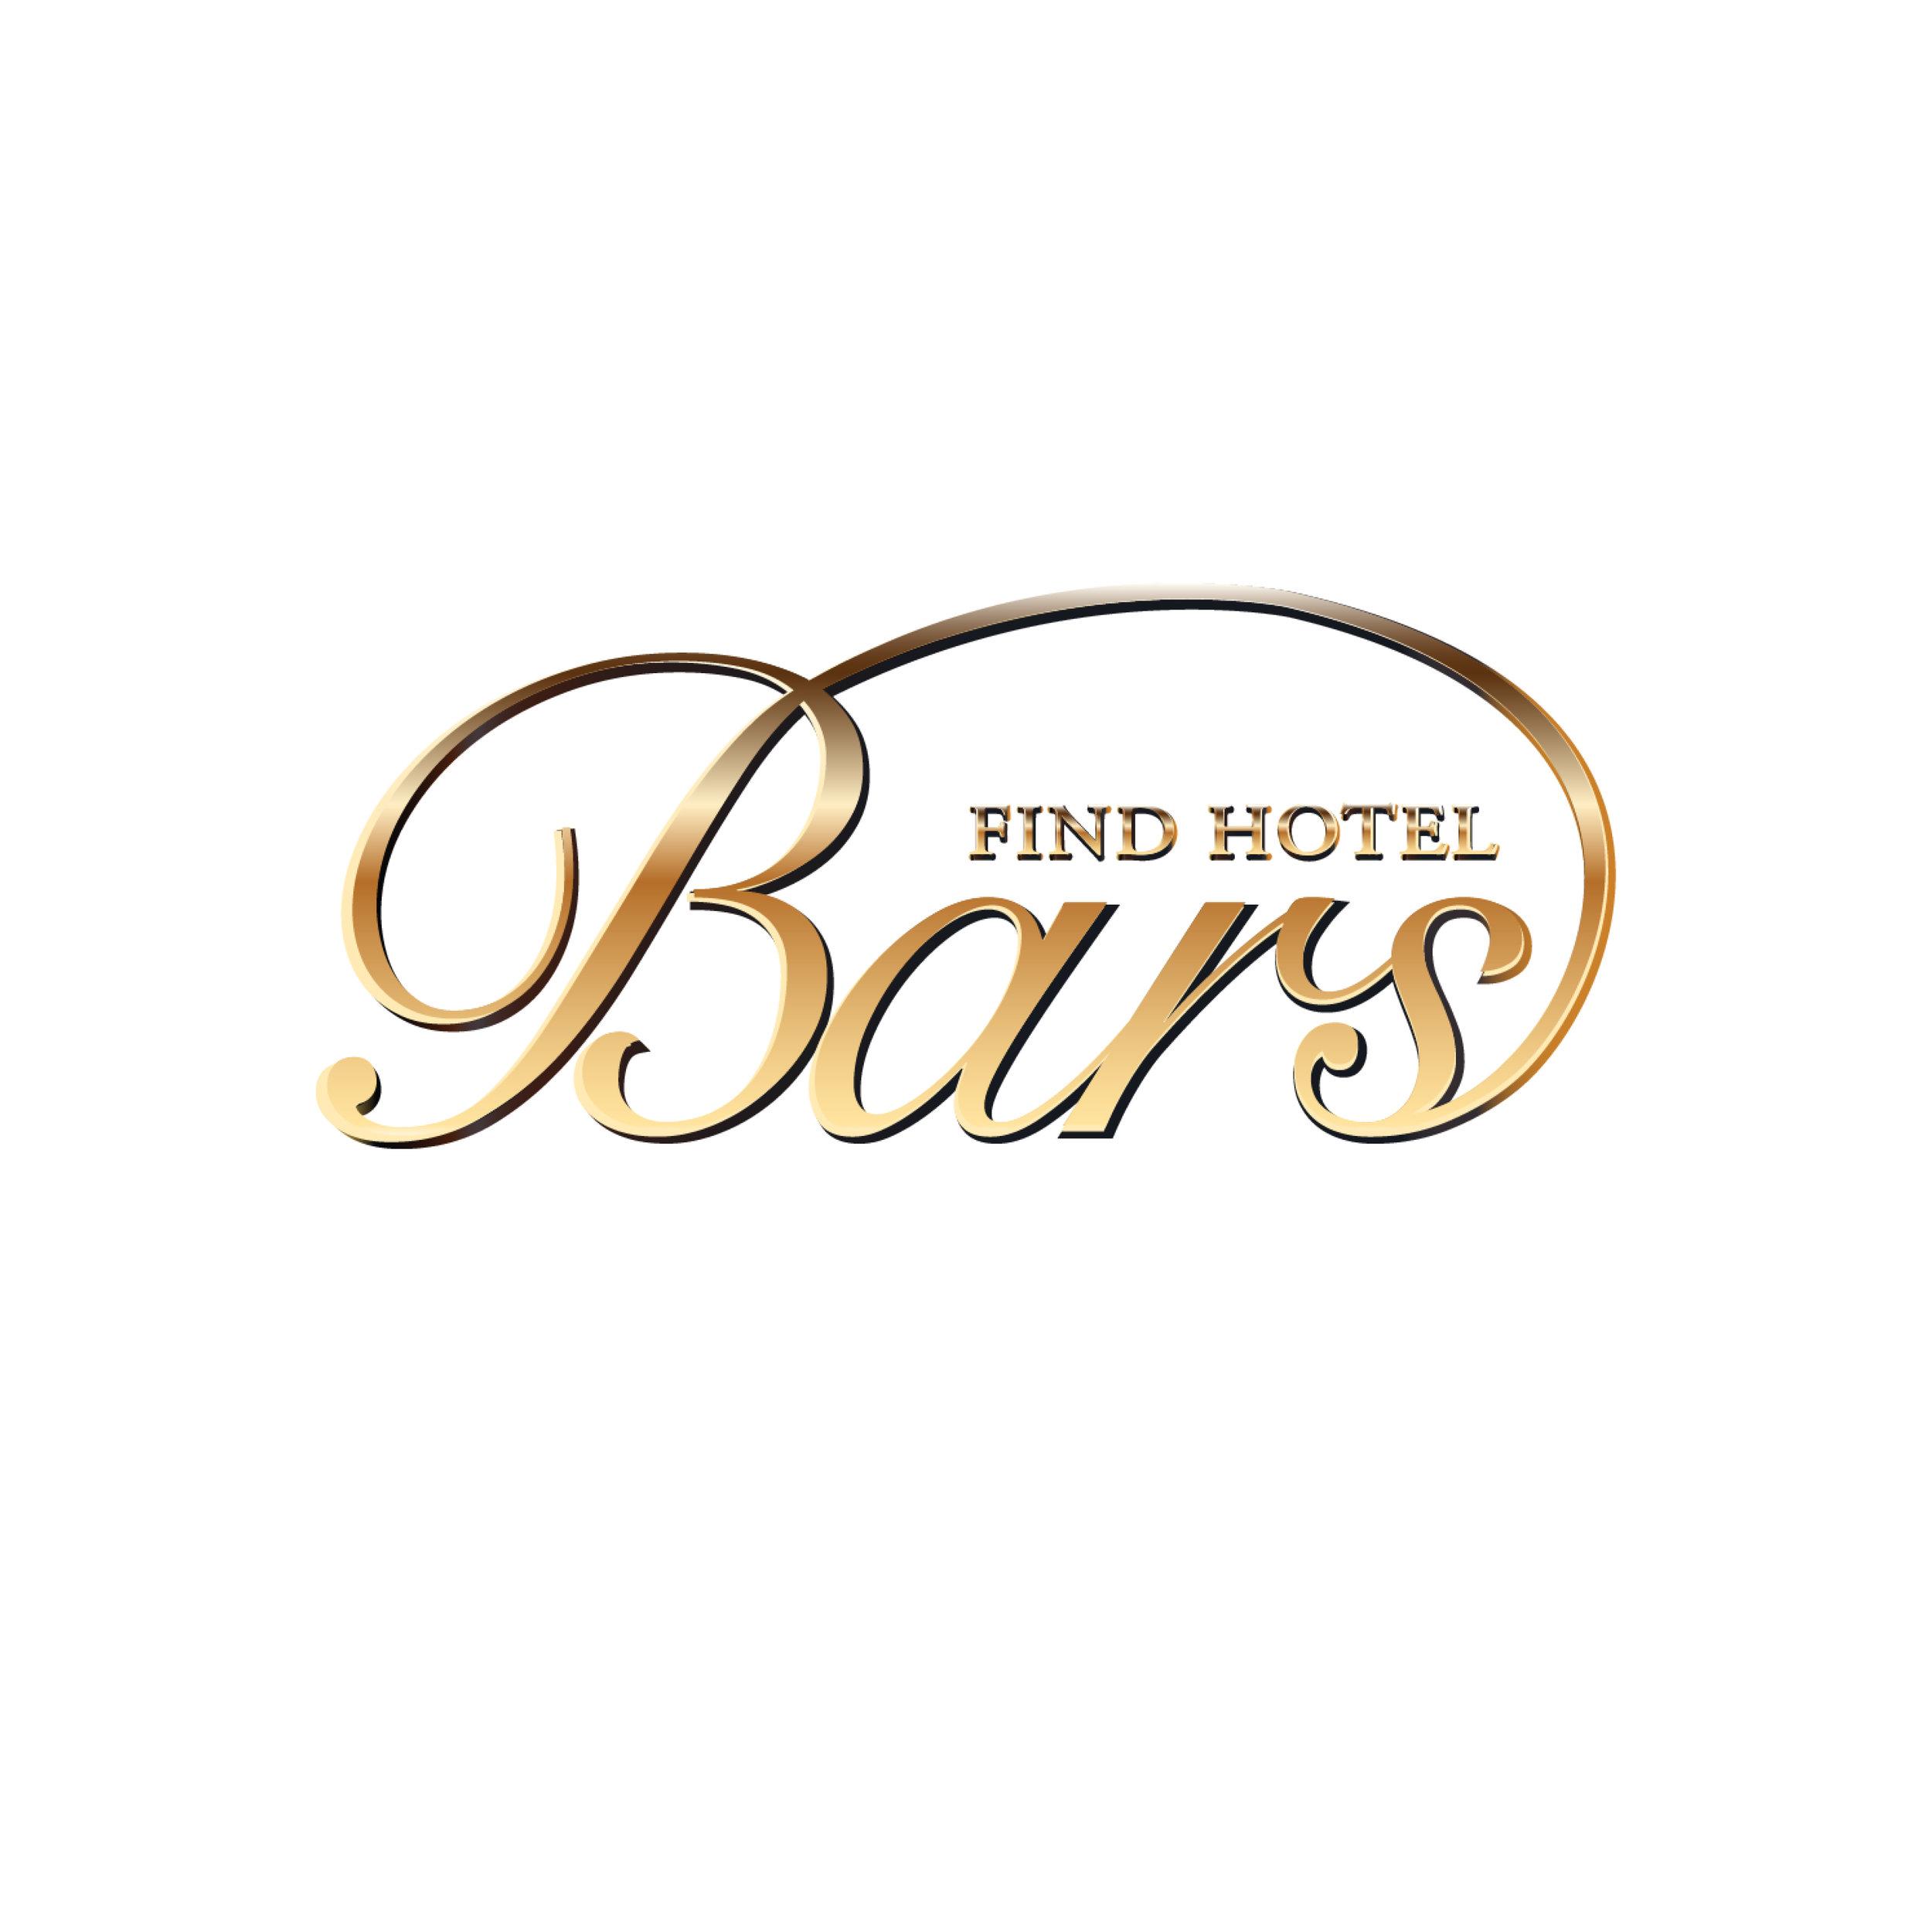 find hotel bars-1.jpg